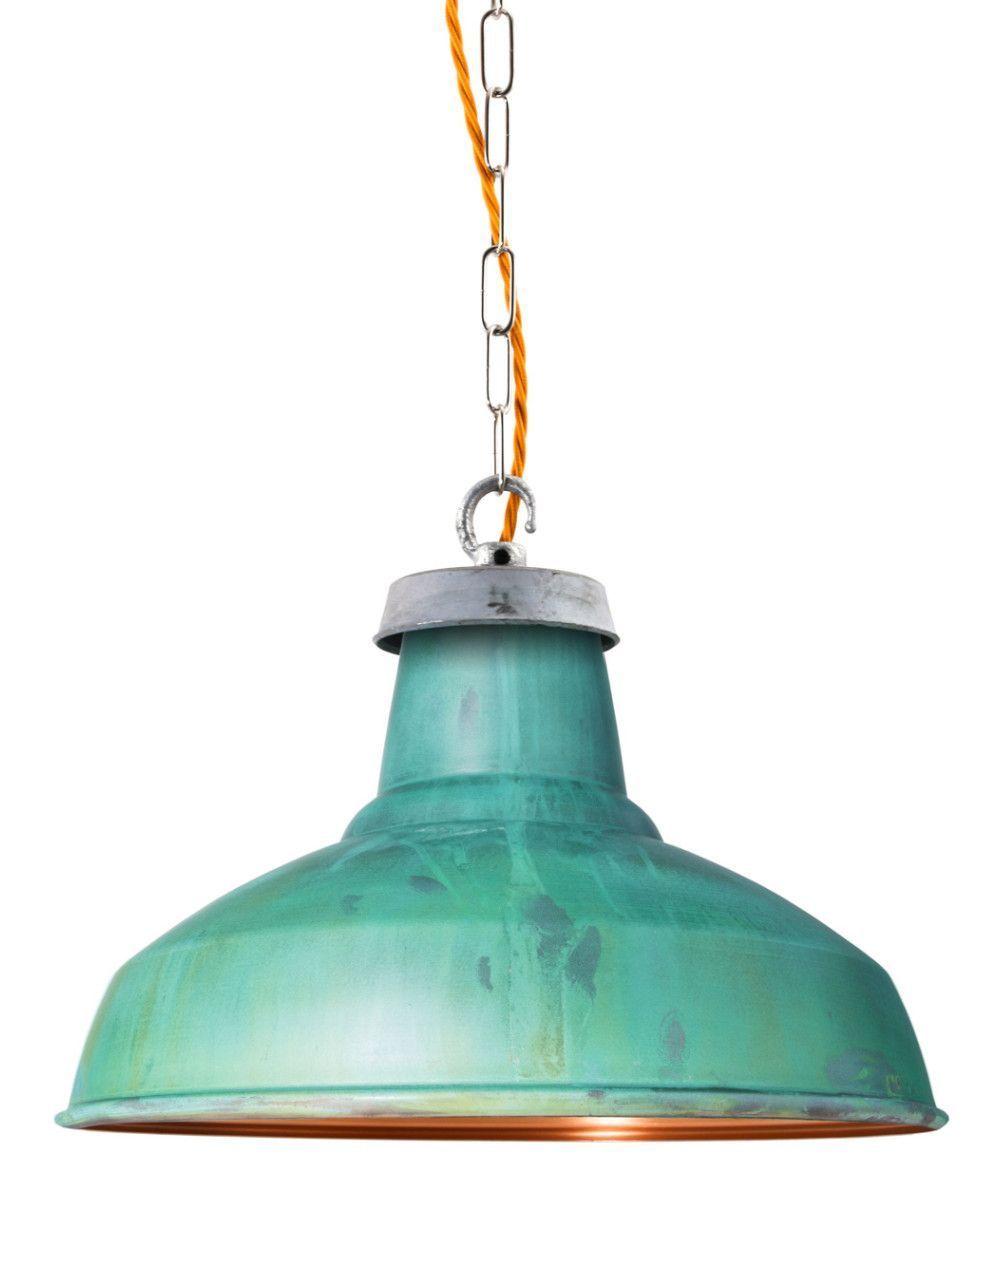 Mind Blowing Unique Ideas Lace Lamp Shades Chandeliers Lamp Shades Gold Bedrooms Lamp Shades Industrial Lamp Shade Metal Lamp Shade Industrial Pendant Lights